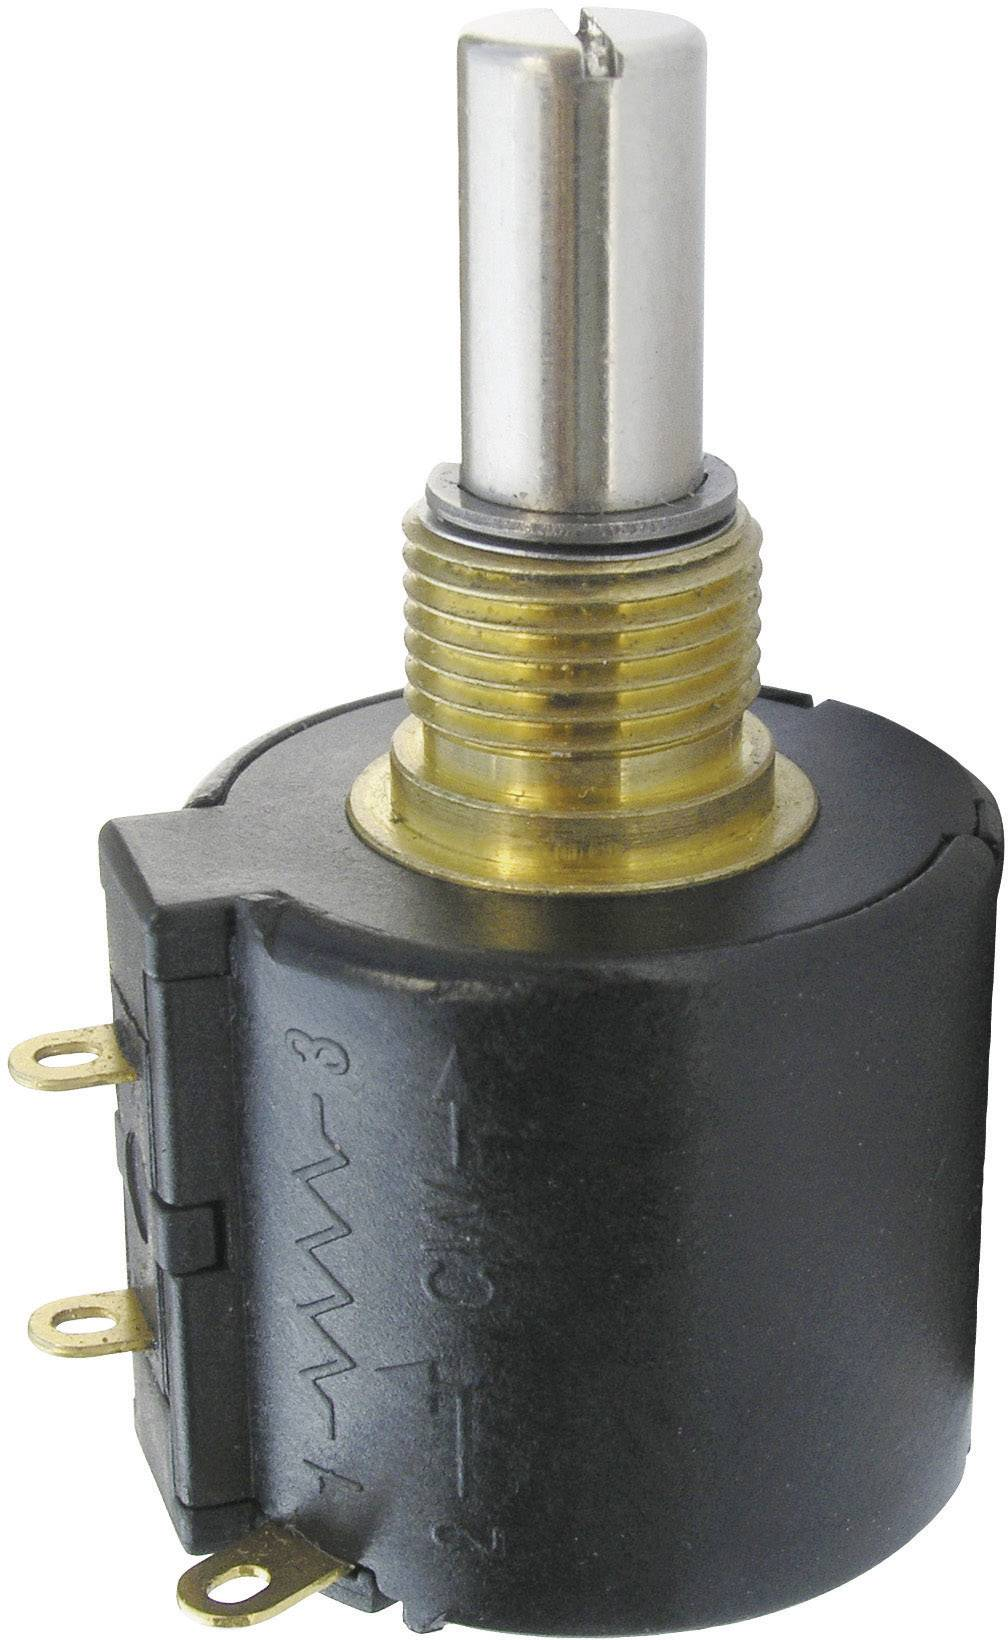 Presný potenciometer Wirewound, 10-cestný mono Bourns 3549S-1AA-104A 3549S-1AA-104A, 2 W, 100 kOhm, 1 ks